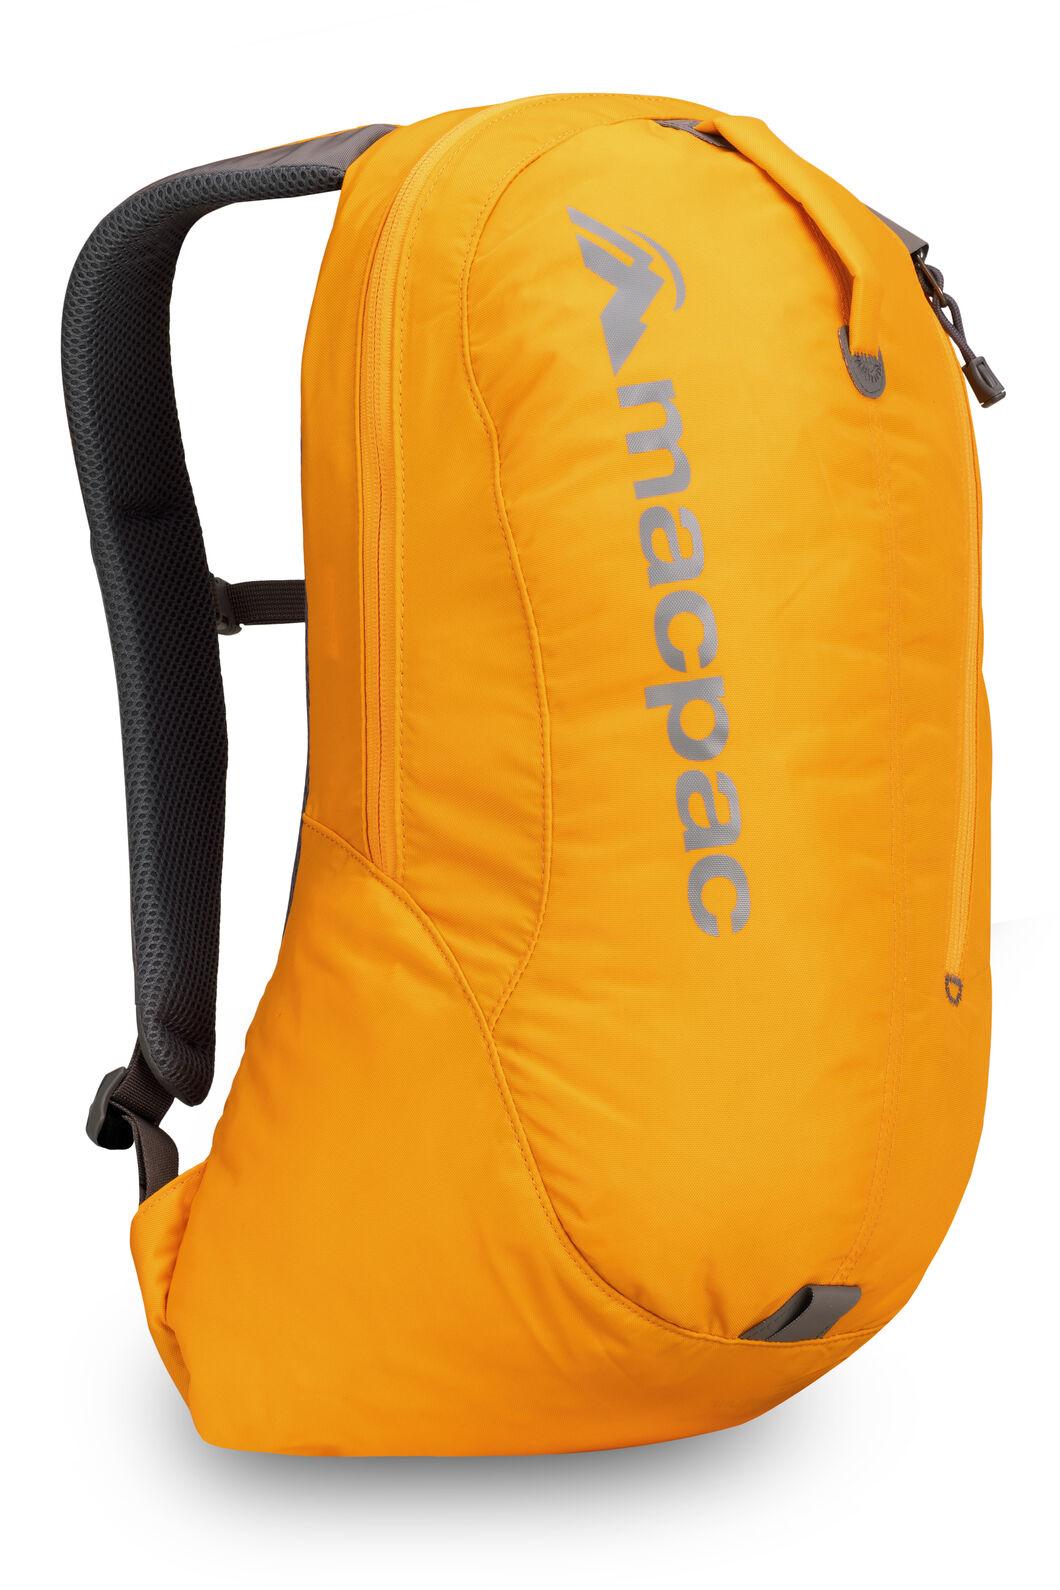 Macpac Kahuna 18L Backpack, Cadmium Yellow, hi-res